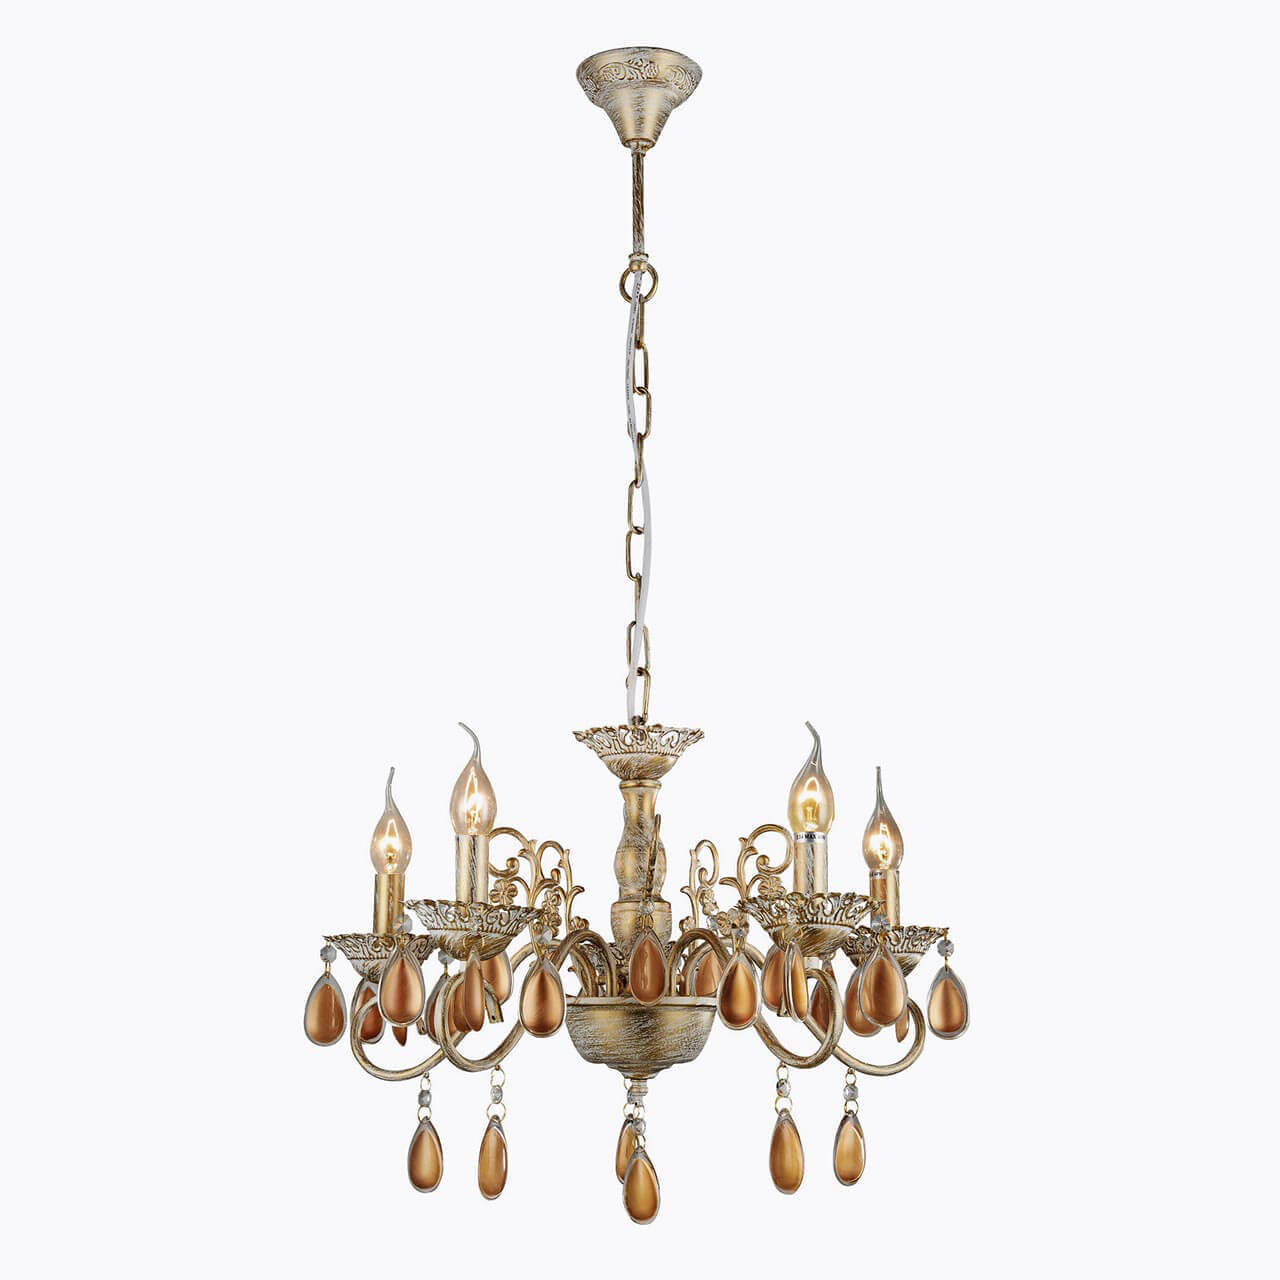 Люстра Arte Lamp A5676LM-5WG Ciondolo люстра подвесная arte lamp подвесная a1511lm 5wg